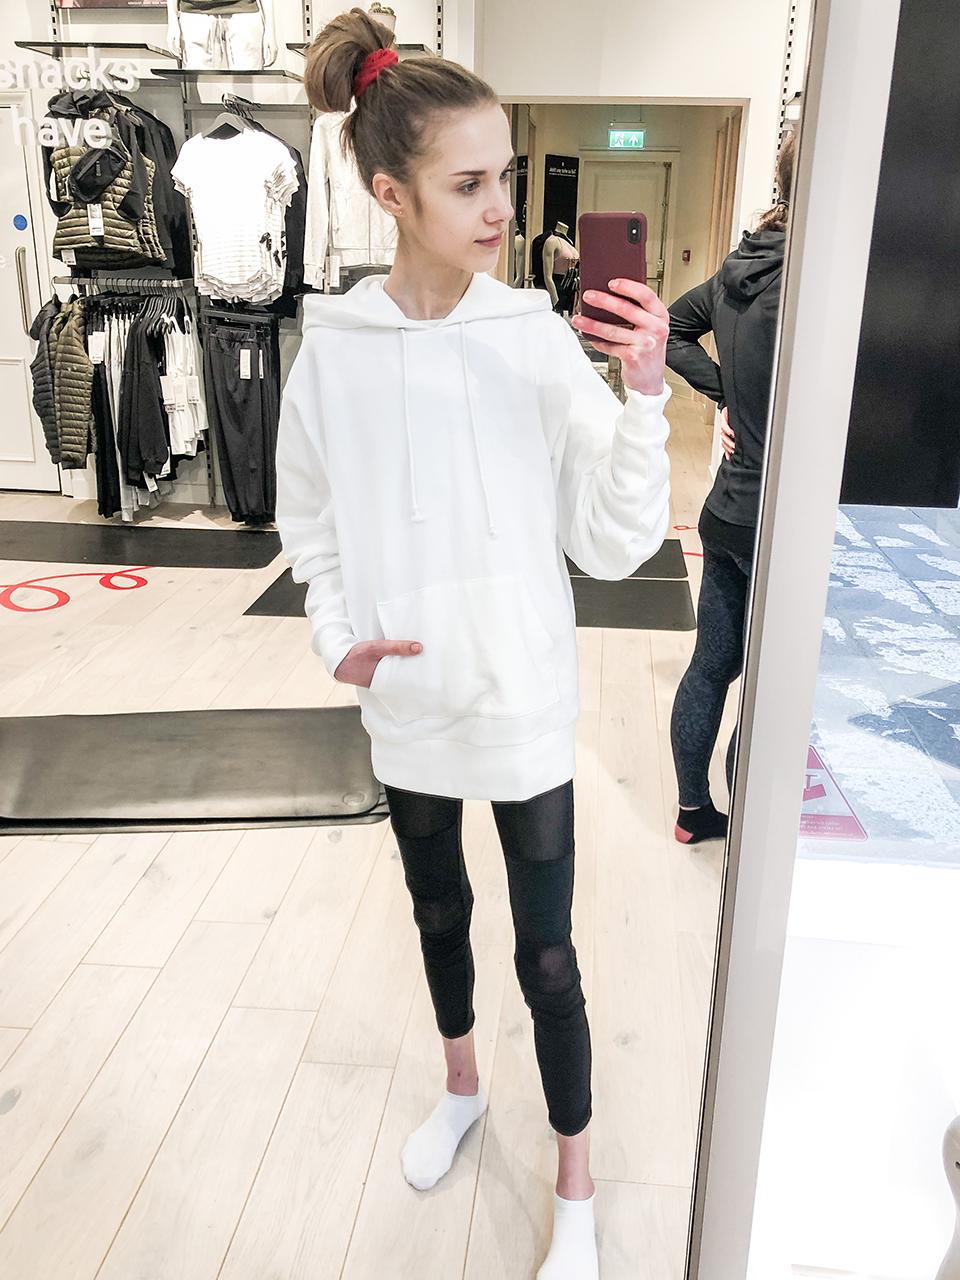 Yogawear, mesh leggings, white cotton hoodie - Joogavaatteet, mesh-leggingsit, valkoinen puuvillahuppari